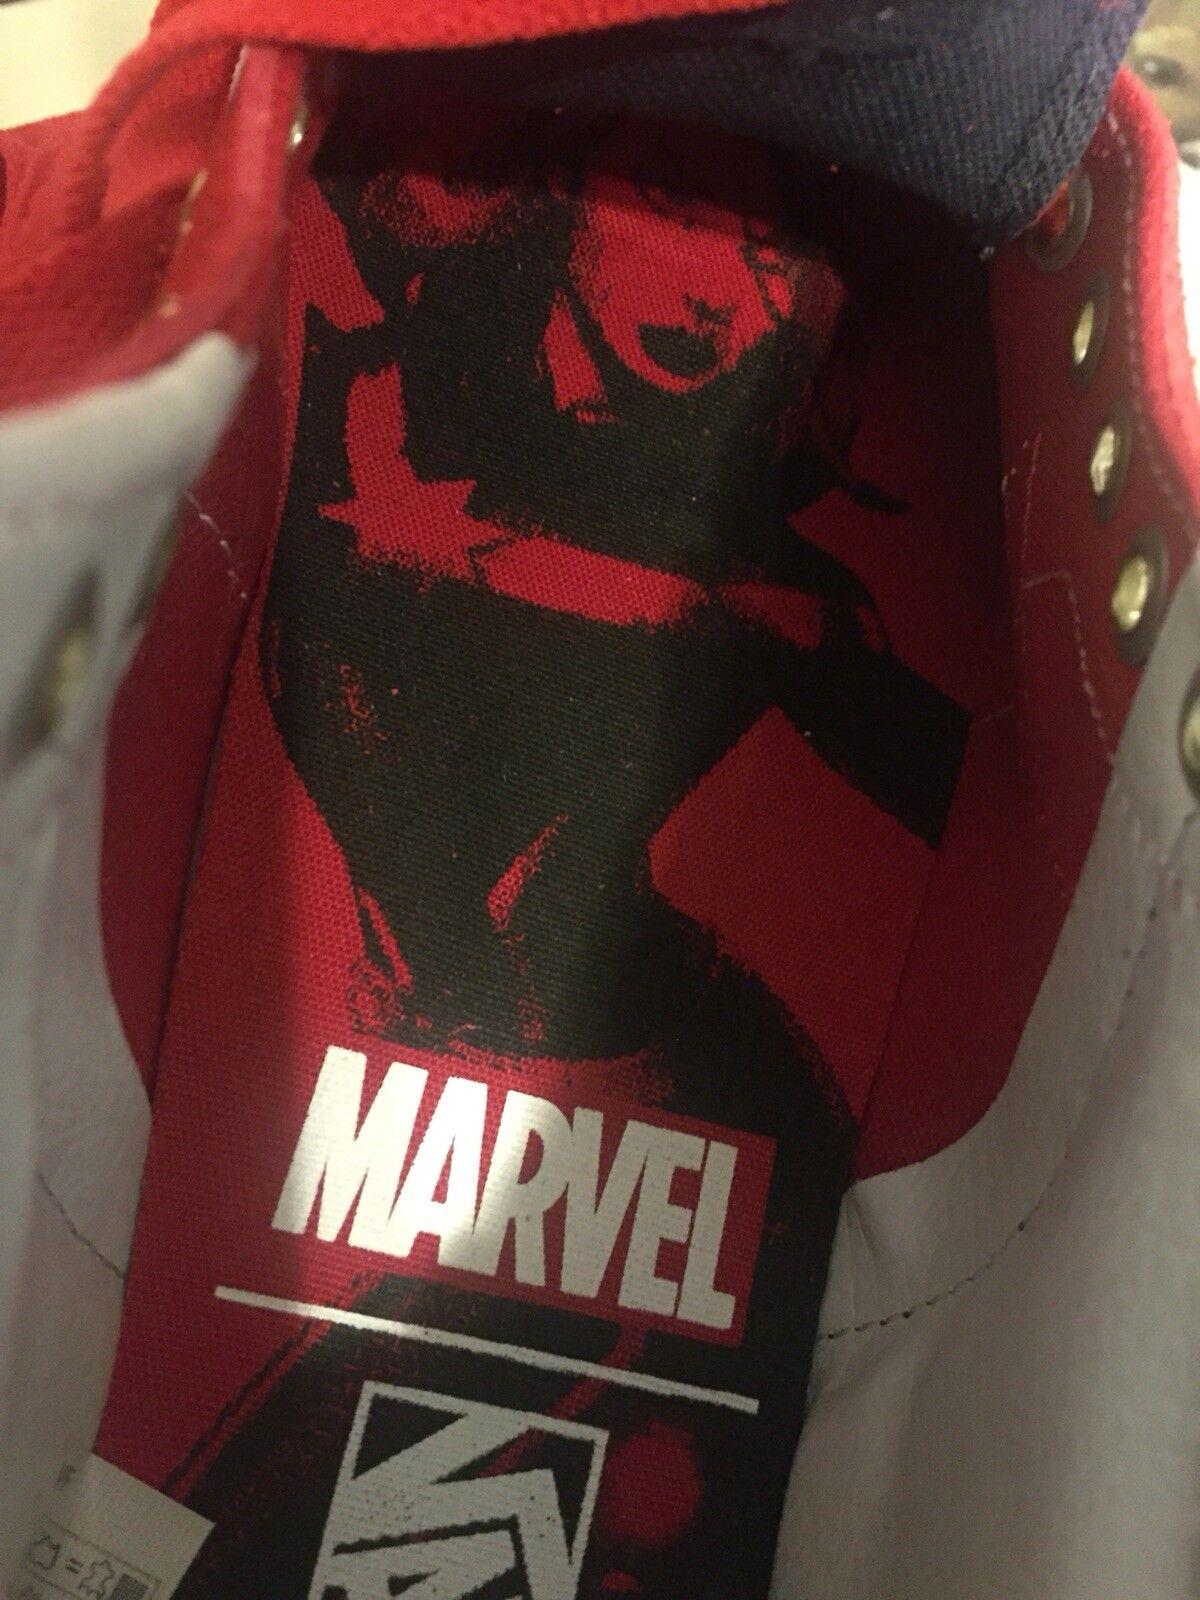 Vans Vans Vans x Marvel Captain Marvel SK8-Hi  Size 5.5 Womens Limited Edition 2018 62eecd